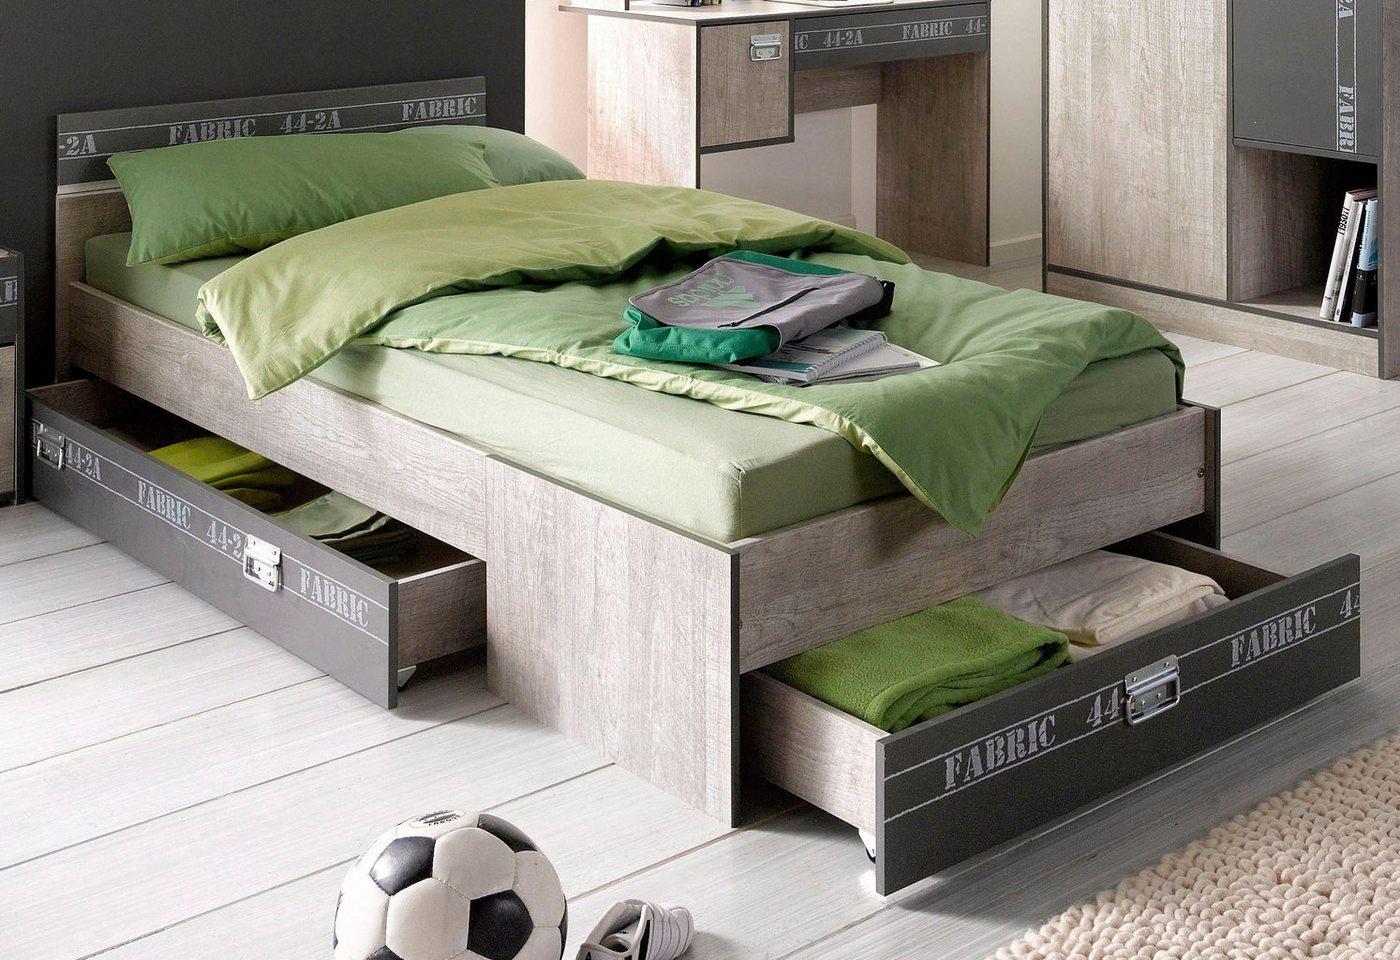 Parisot bed Fabric, incl. laden